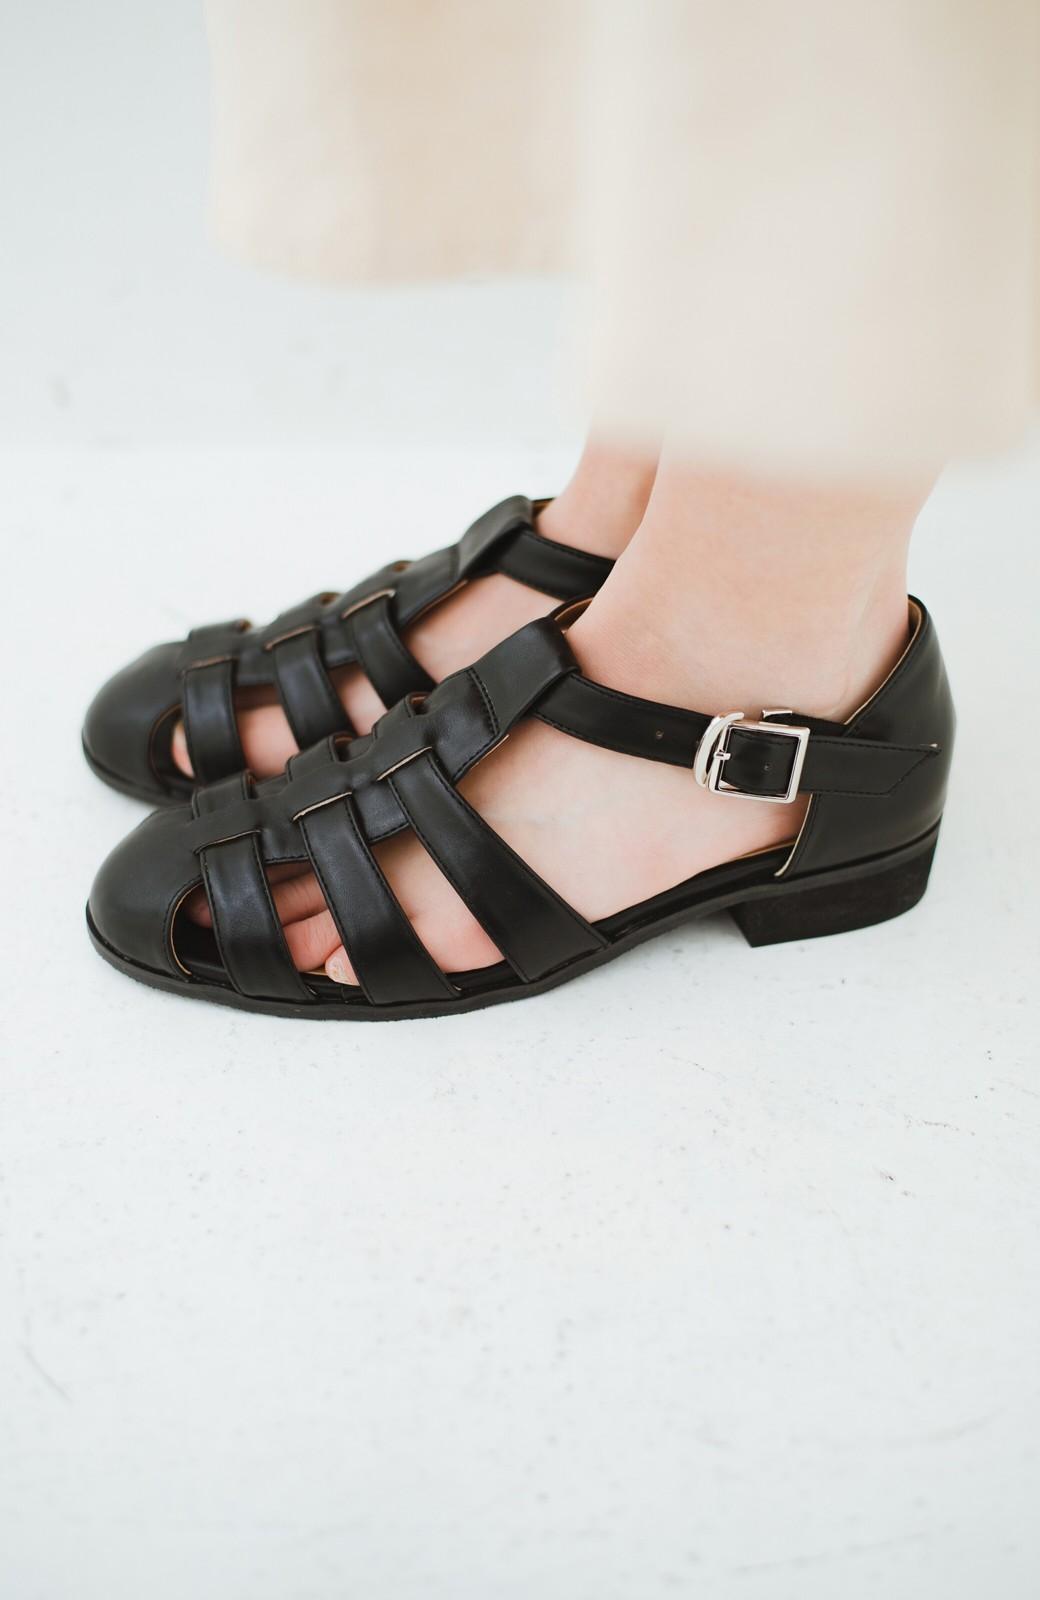 haco! 靴下でも素足でも合う 本革風編み込みサンダル <ブラック>の商品写真3